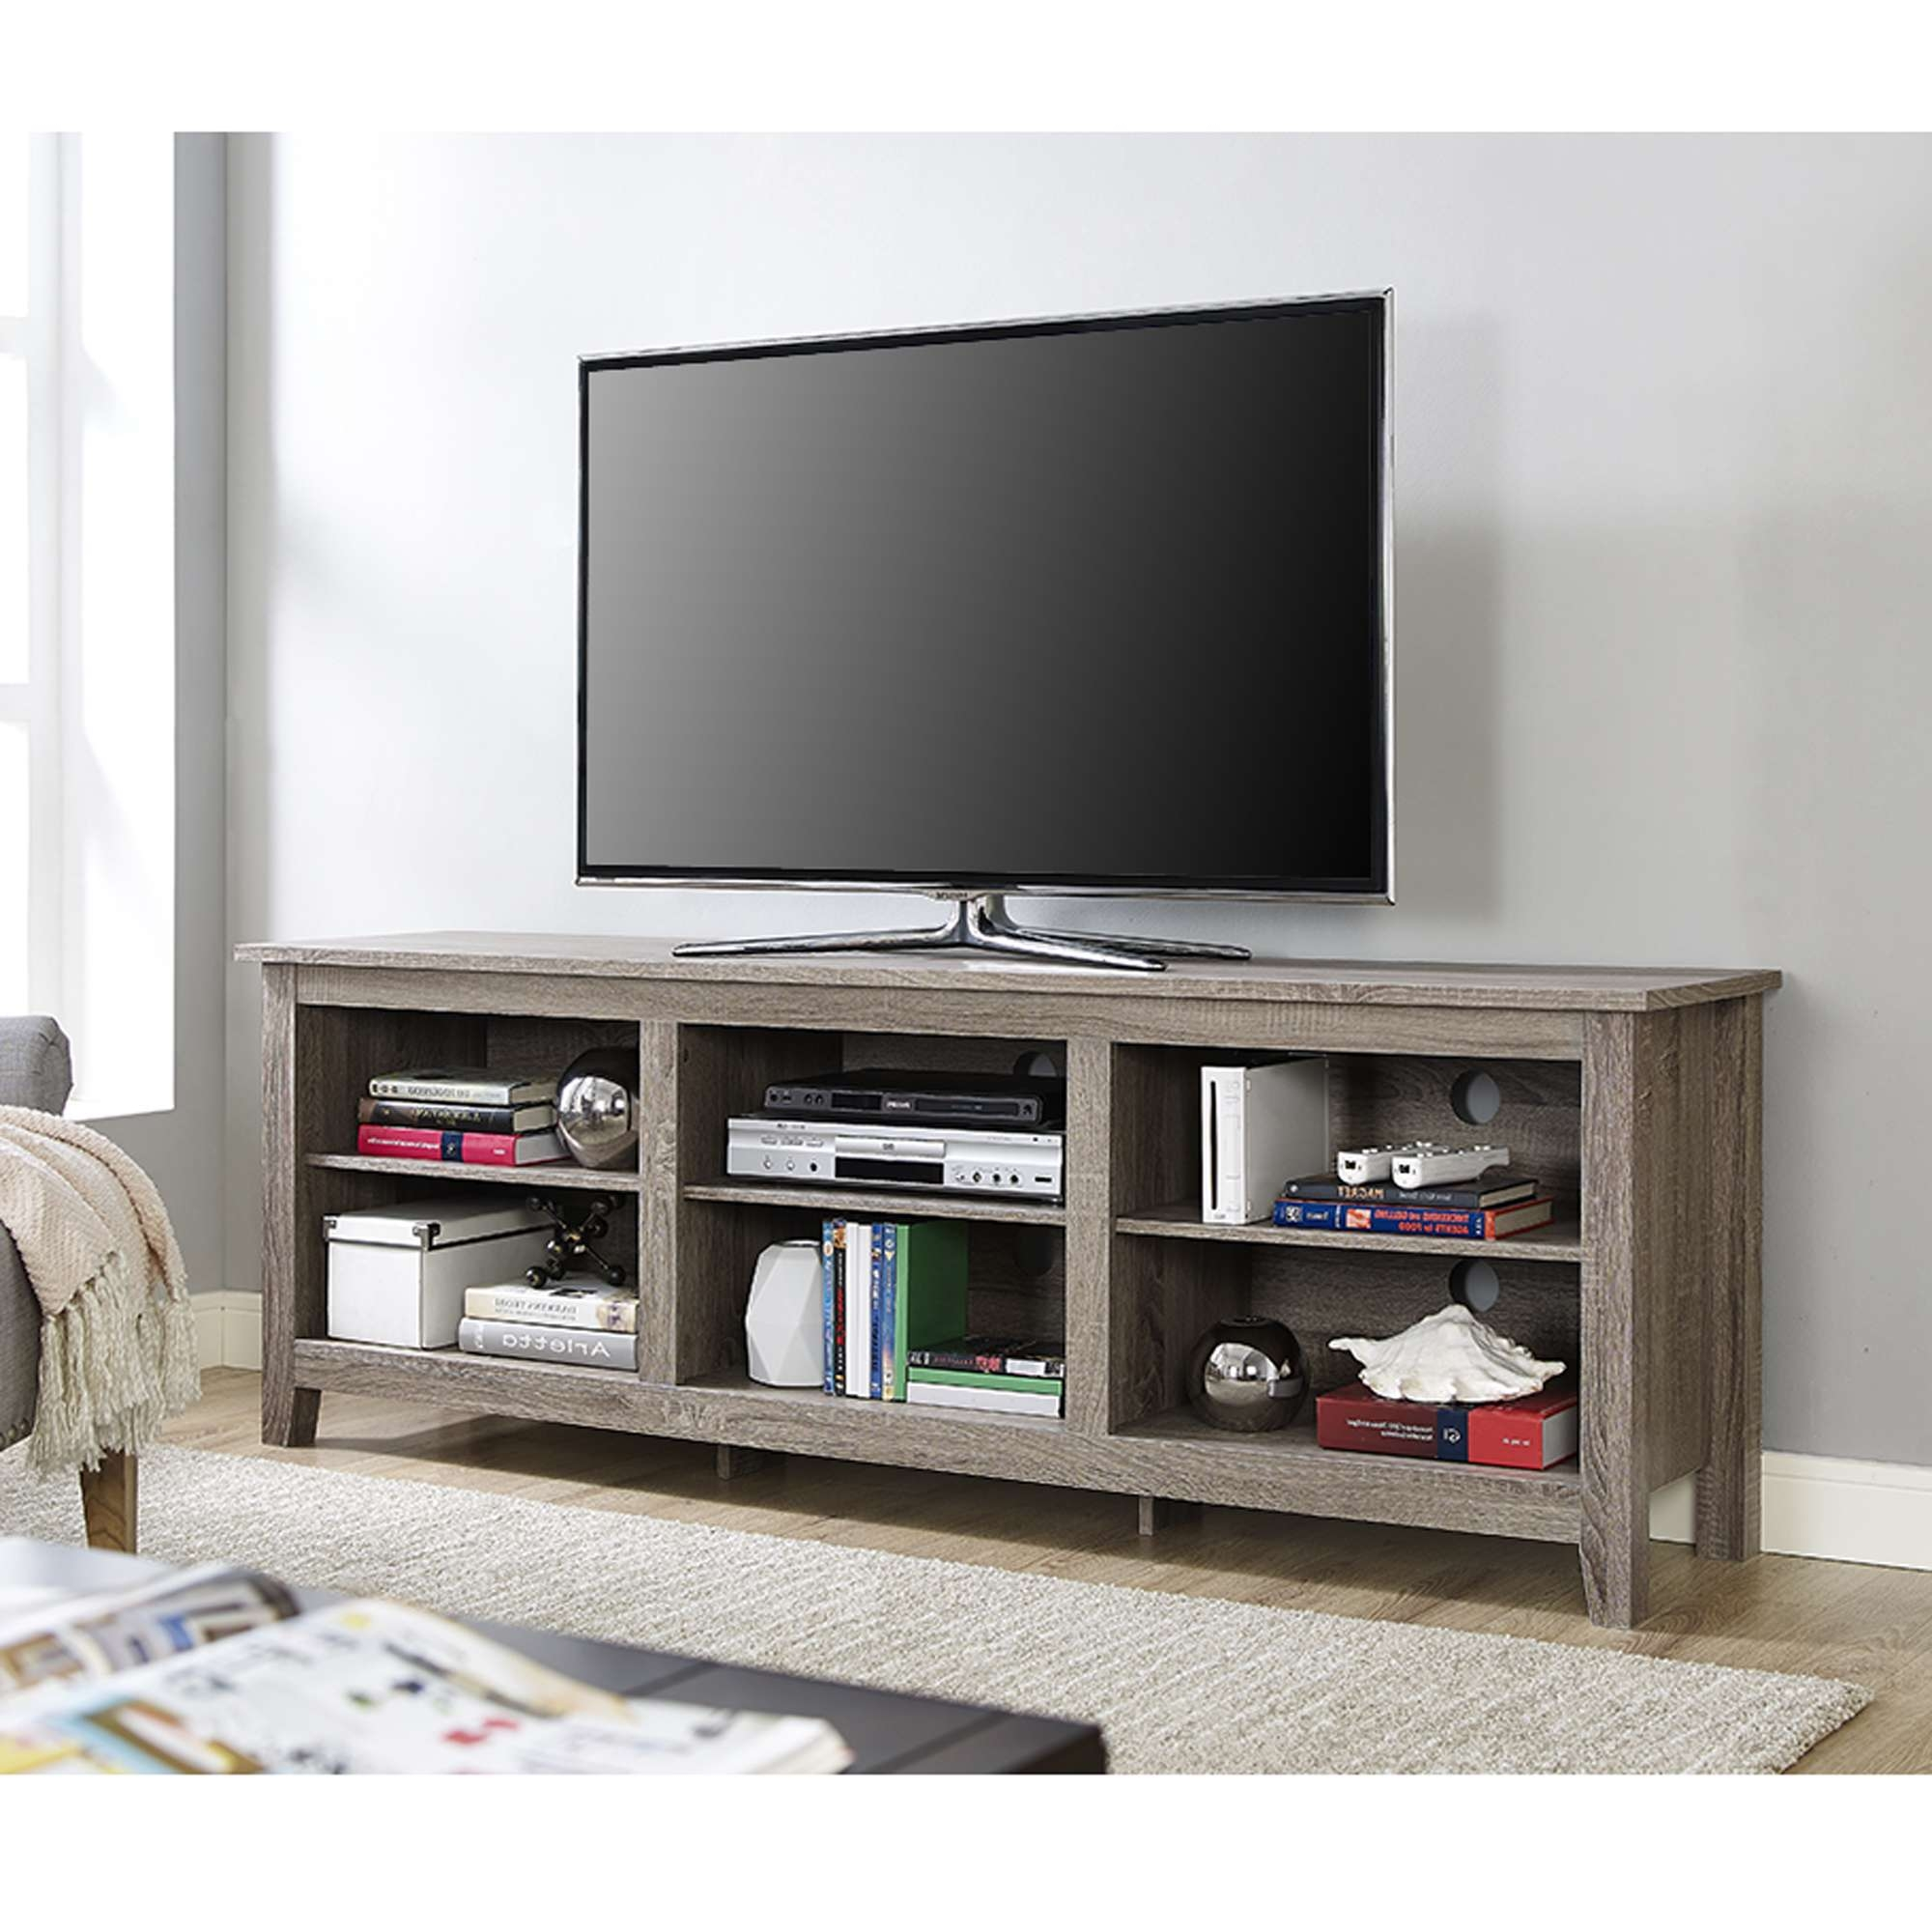 Tv : Light Wood Tv Stand 04 07 Amazing Light Brown Tv Stands Light Within Light Brown Tv Stands (View 20 of 20)